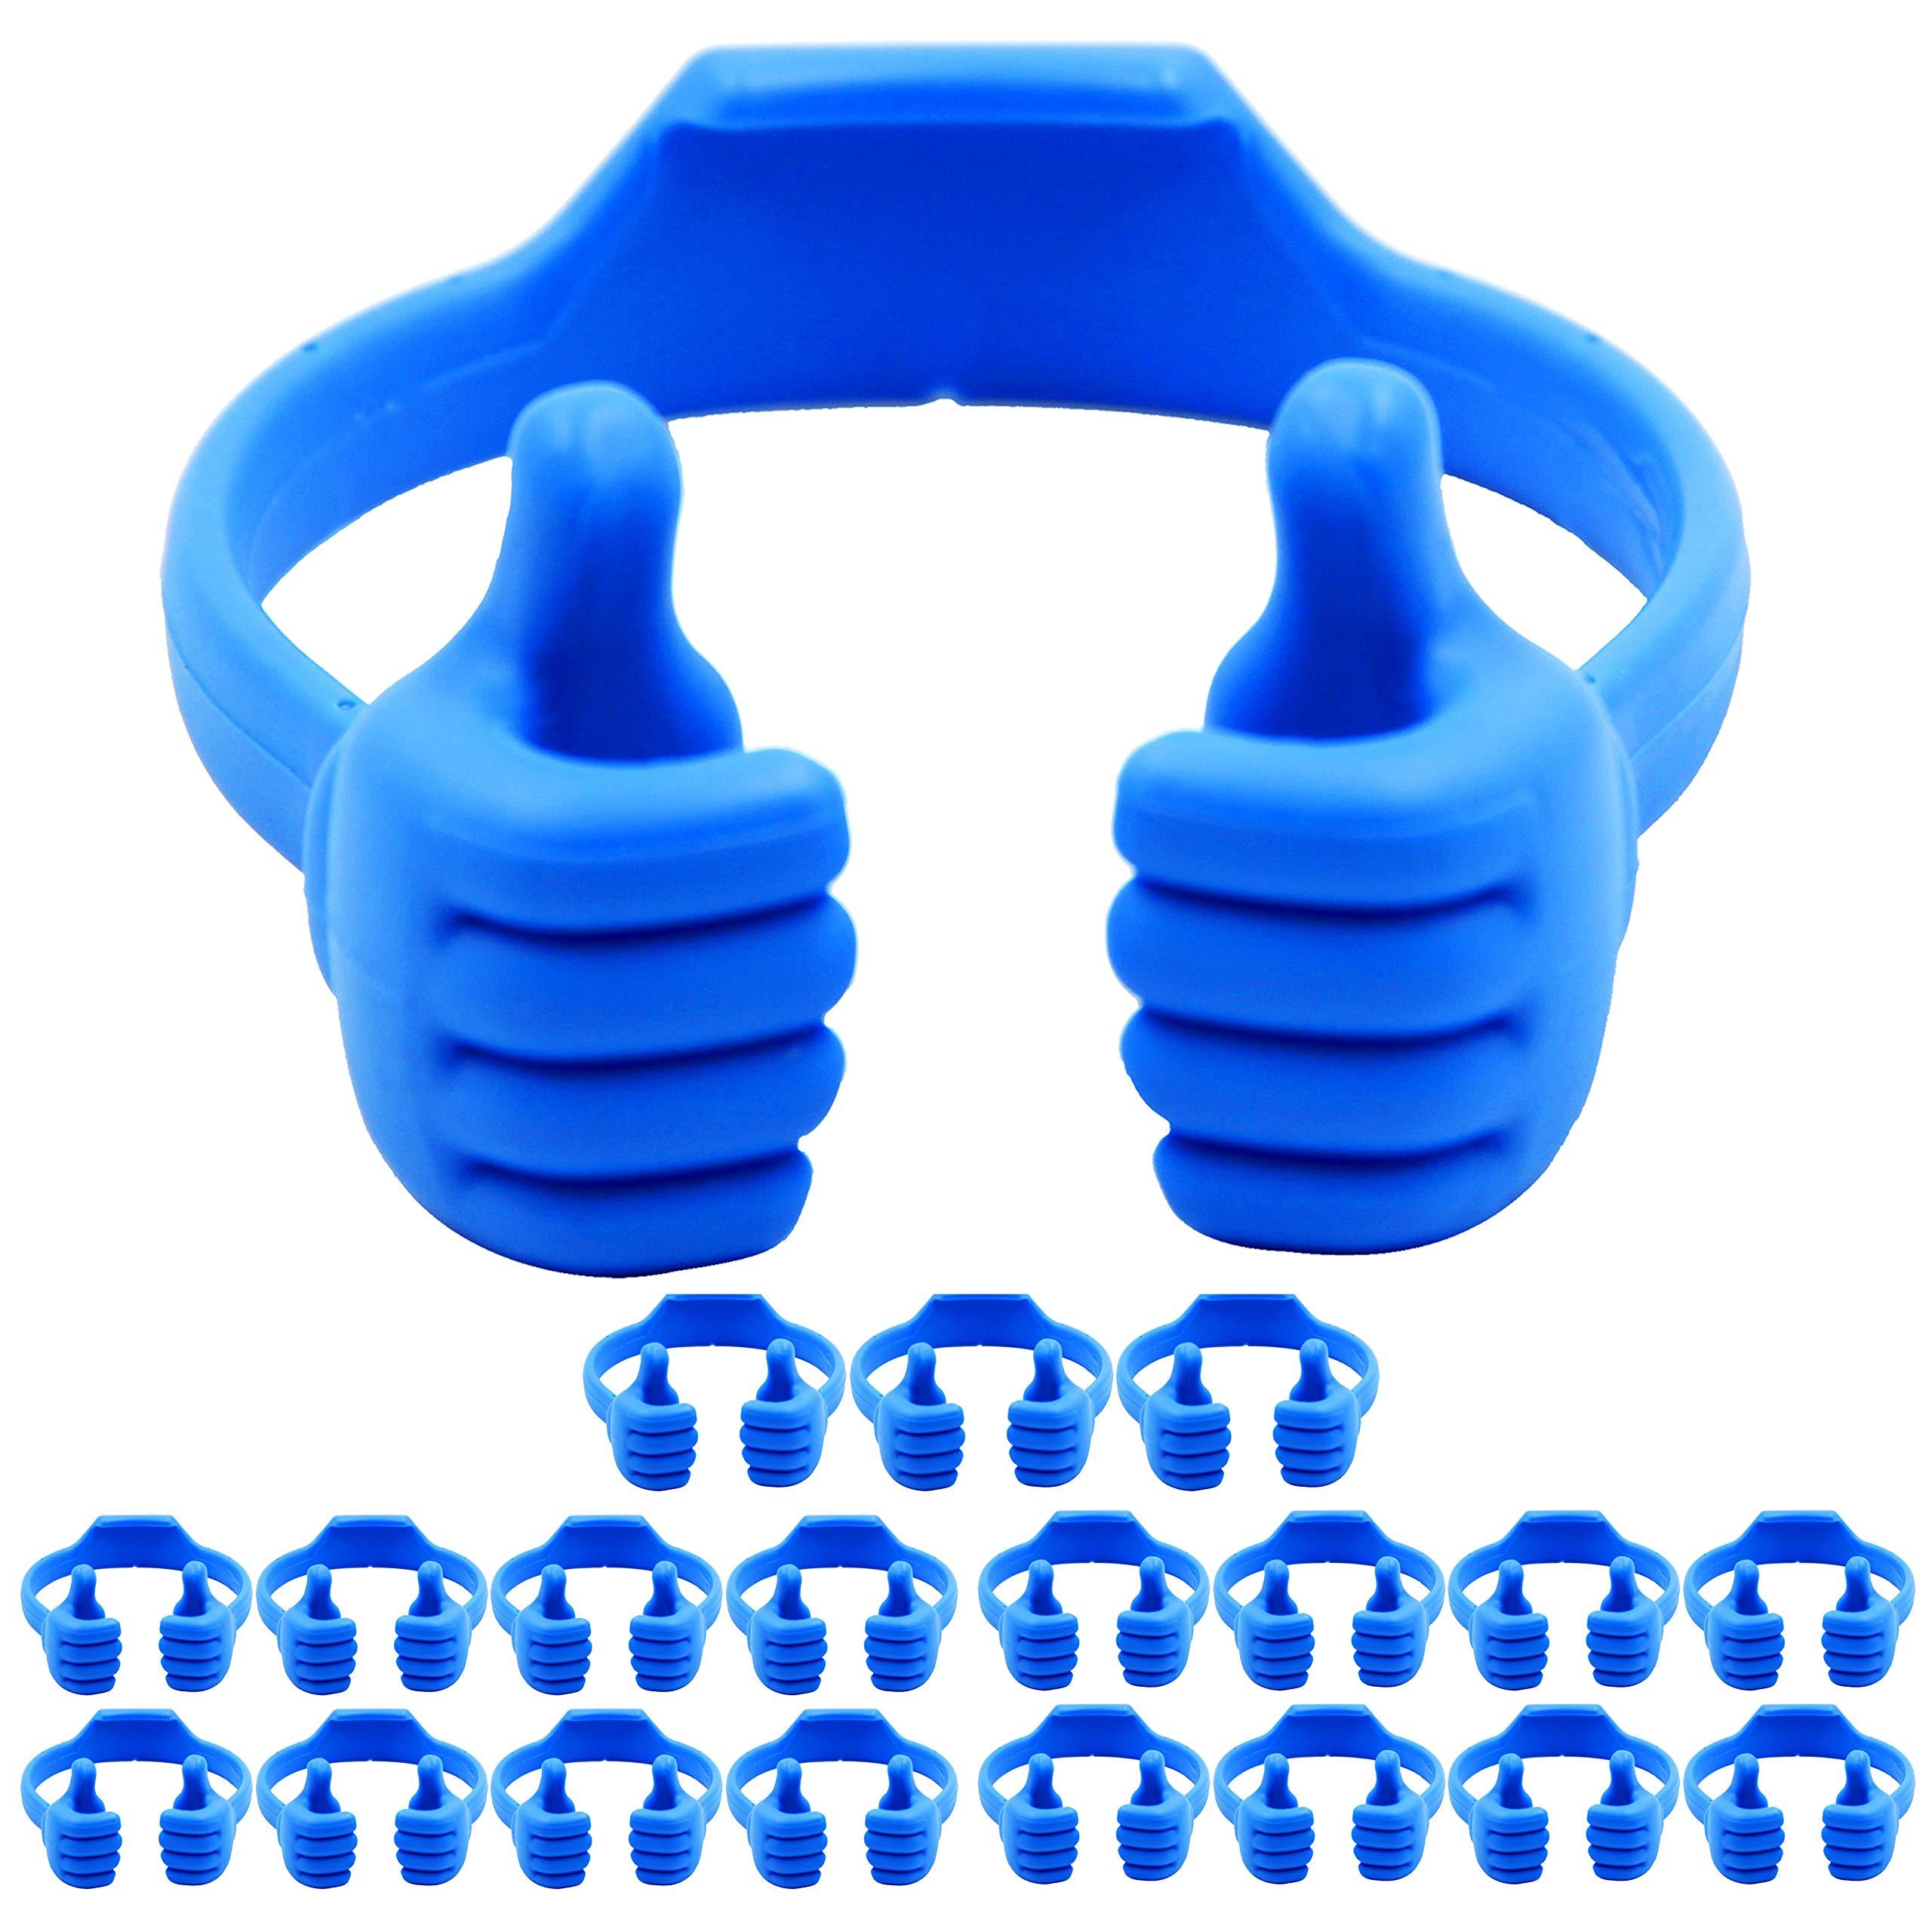 Cell Phone Tablet Stands (20 Packs): Honsky Thumbs-up Cellphone Holder, Tablet Display Stand, Mobile Smartphone Mount Cradle for Desk Desktop - Universal, Multi-Angle, Cute, Blue